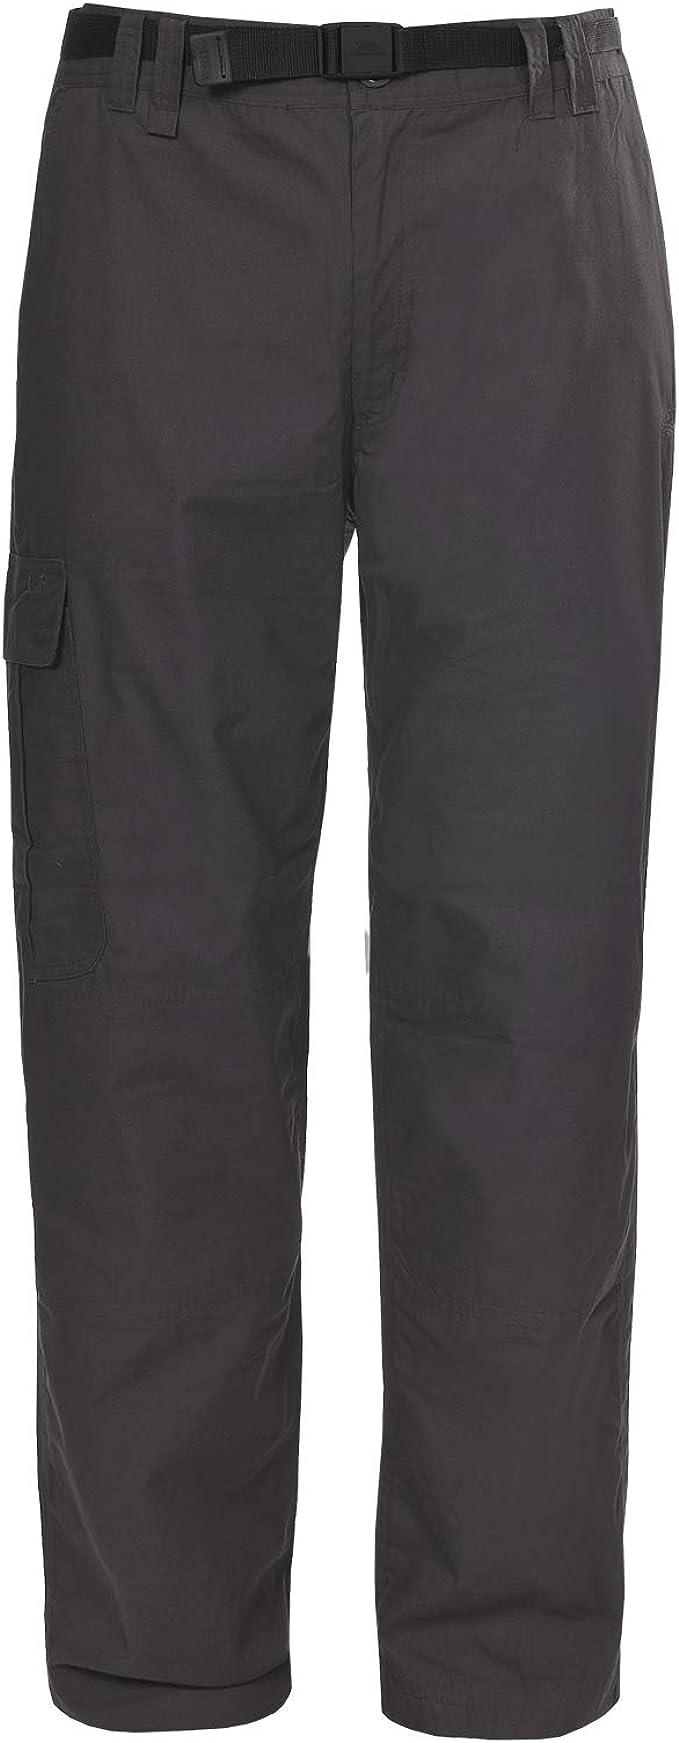 Color Caqui Hombre Pantalones Termicos Para Hombre Trespass Clifton Thermal Clifton Hombre Ropa Interior Burnsidefamilypractice Com Au